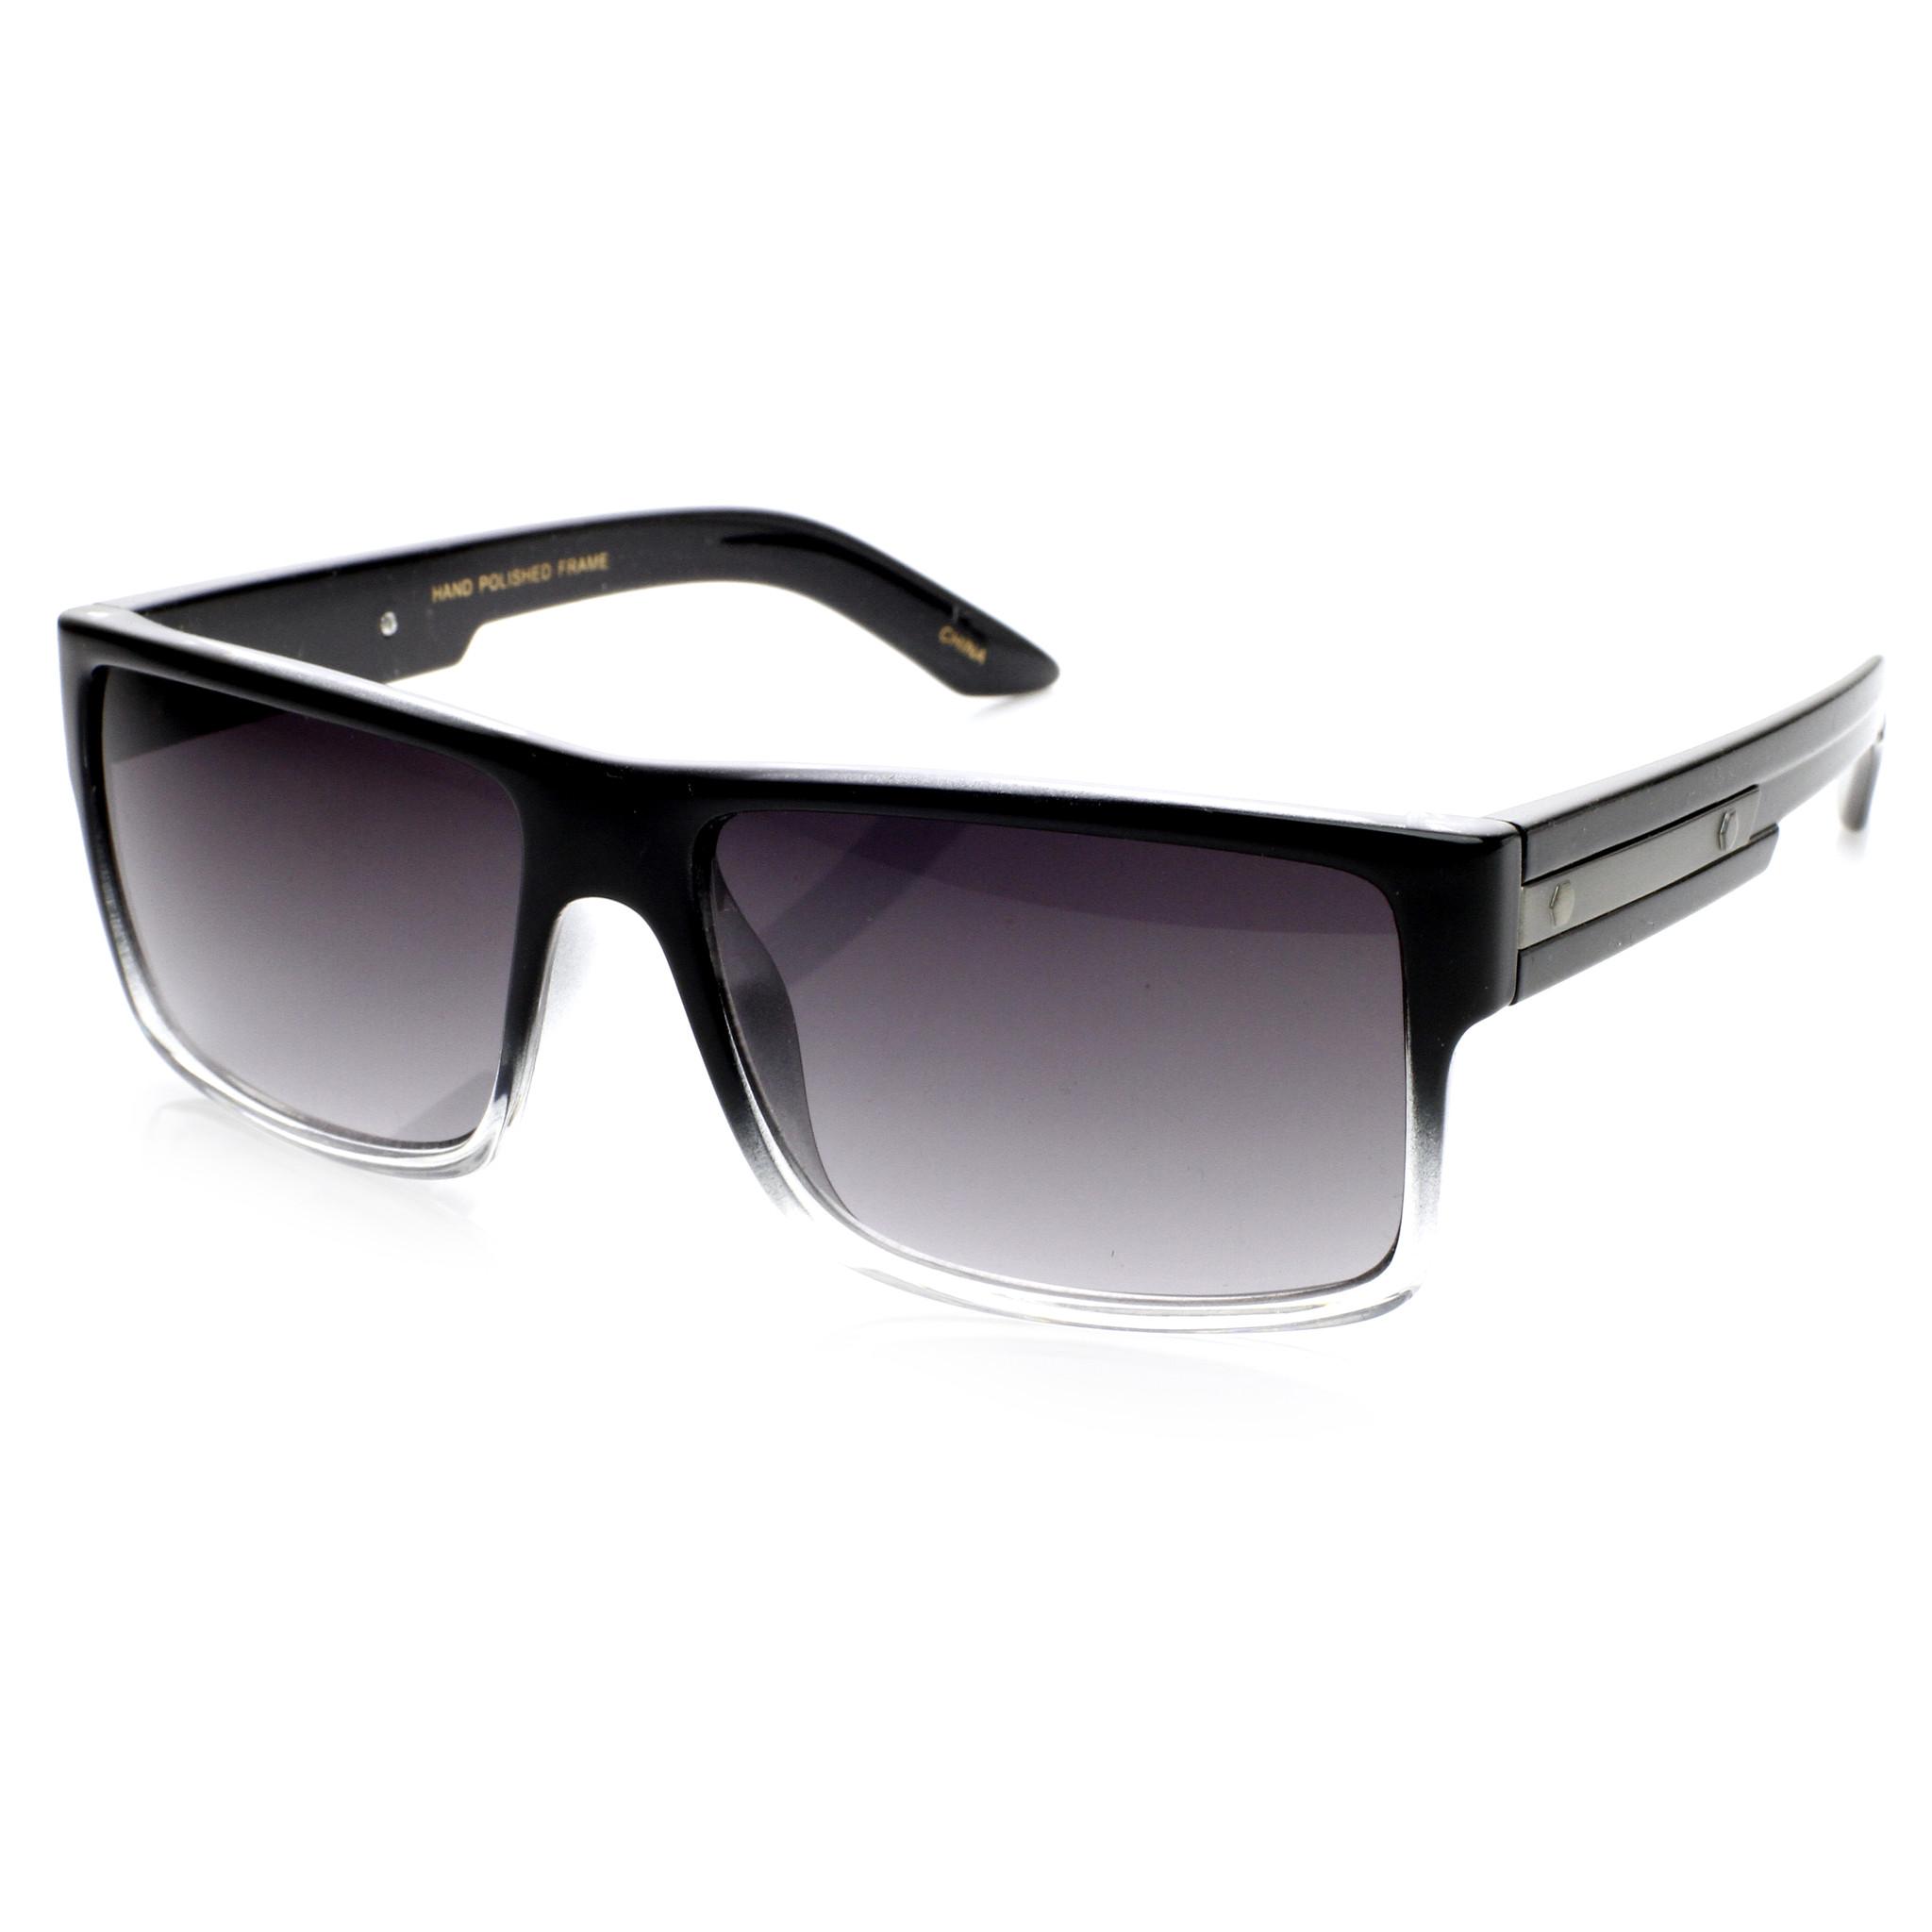 c05cae72ac Oakley Prescription Sunglasses Nottingham « One More Soul